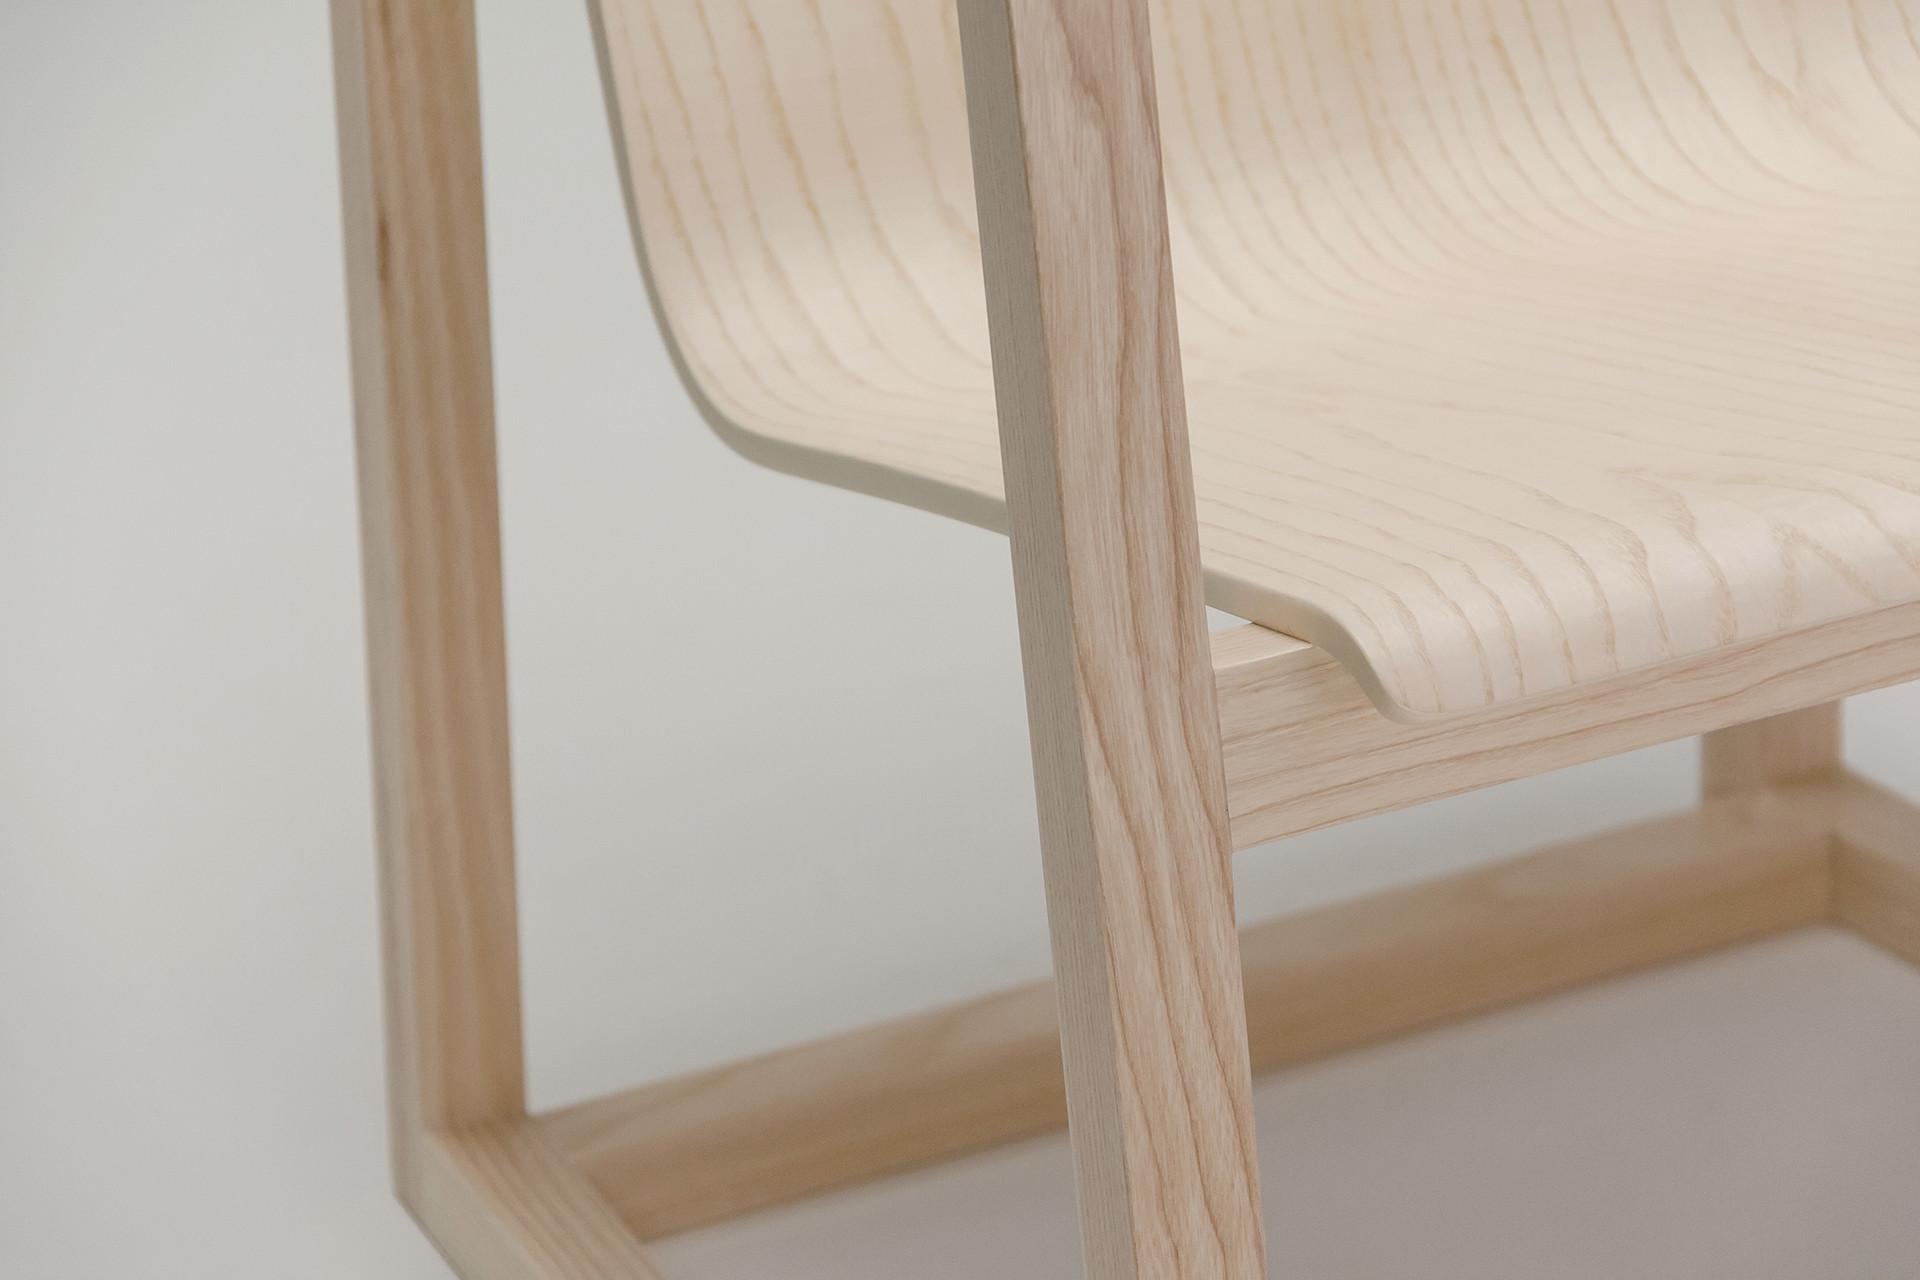 Serene-Easy-Chair_10_1920x1280_72dpi.jpg